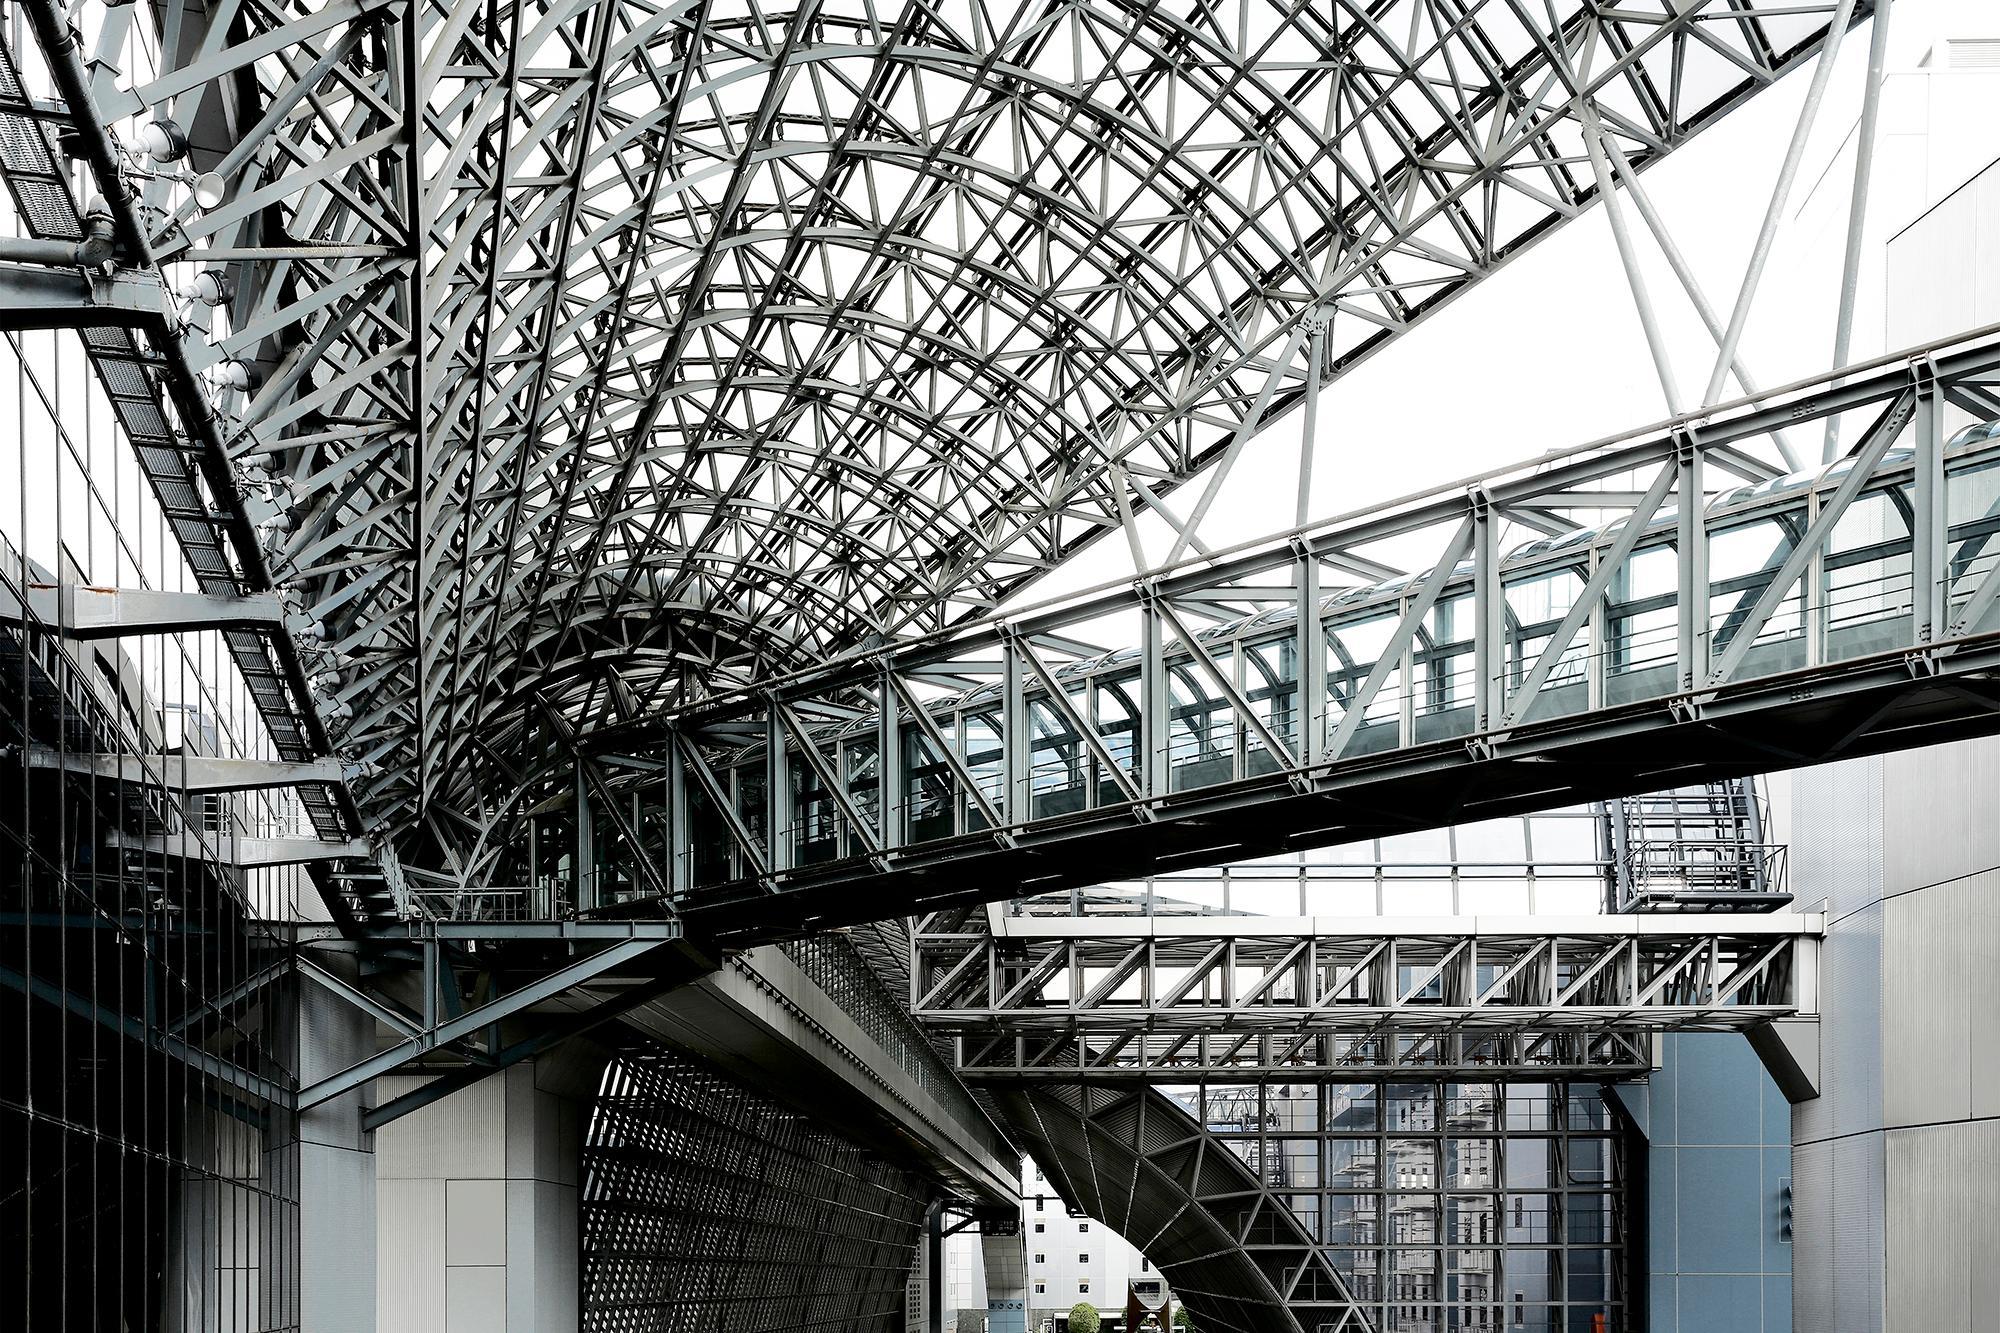 Italian Contemporary Photo by Francesca Pompei - The Station #2